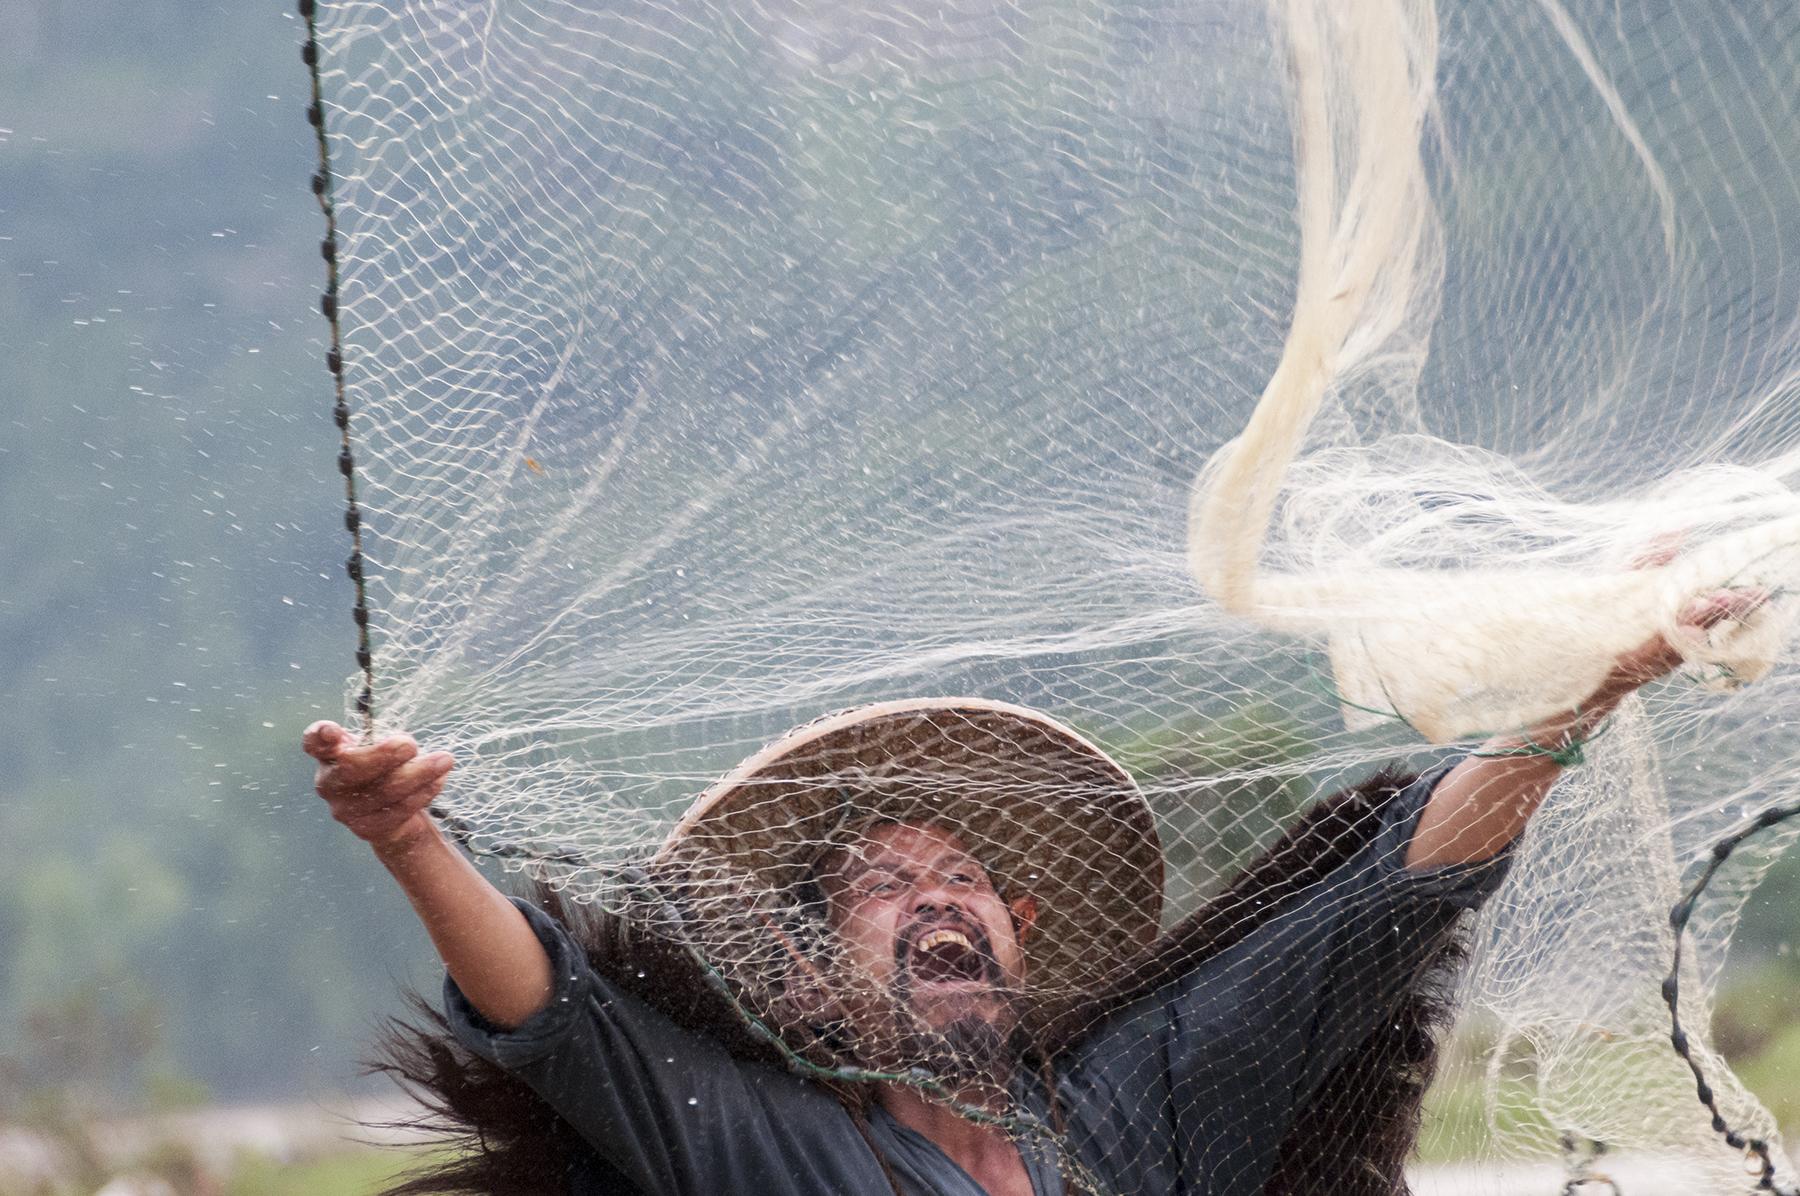 Marlene_Miyamoto_Dying Arts_Cormorant Fisherman 2_2.jpg